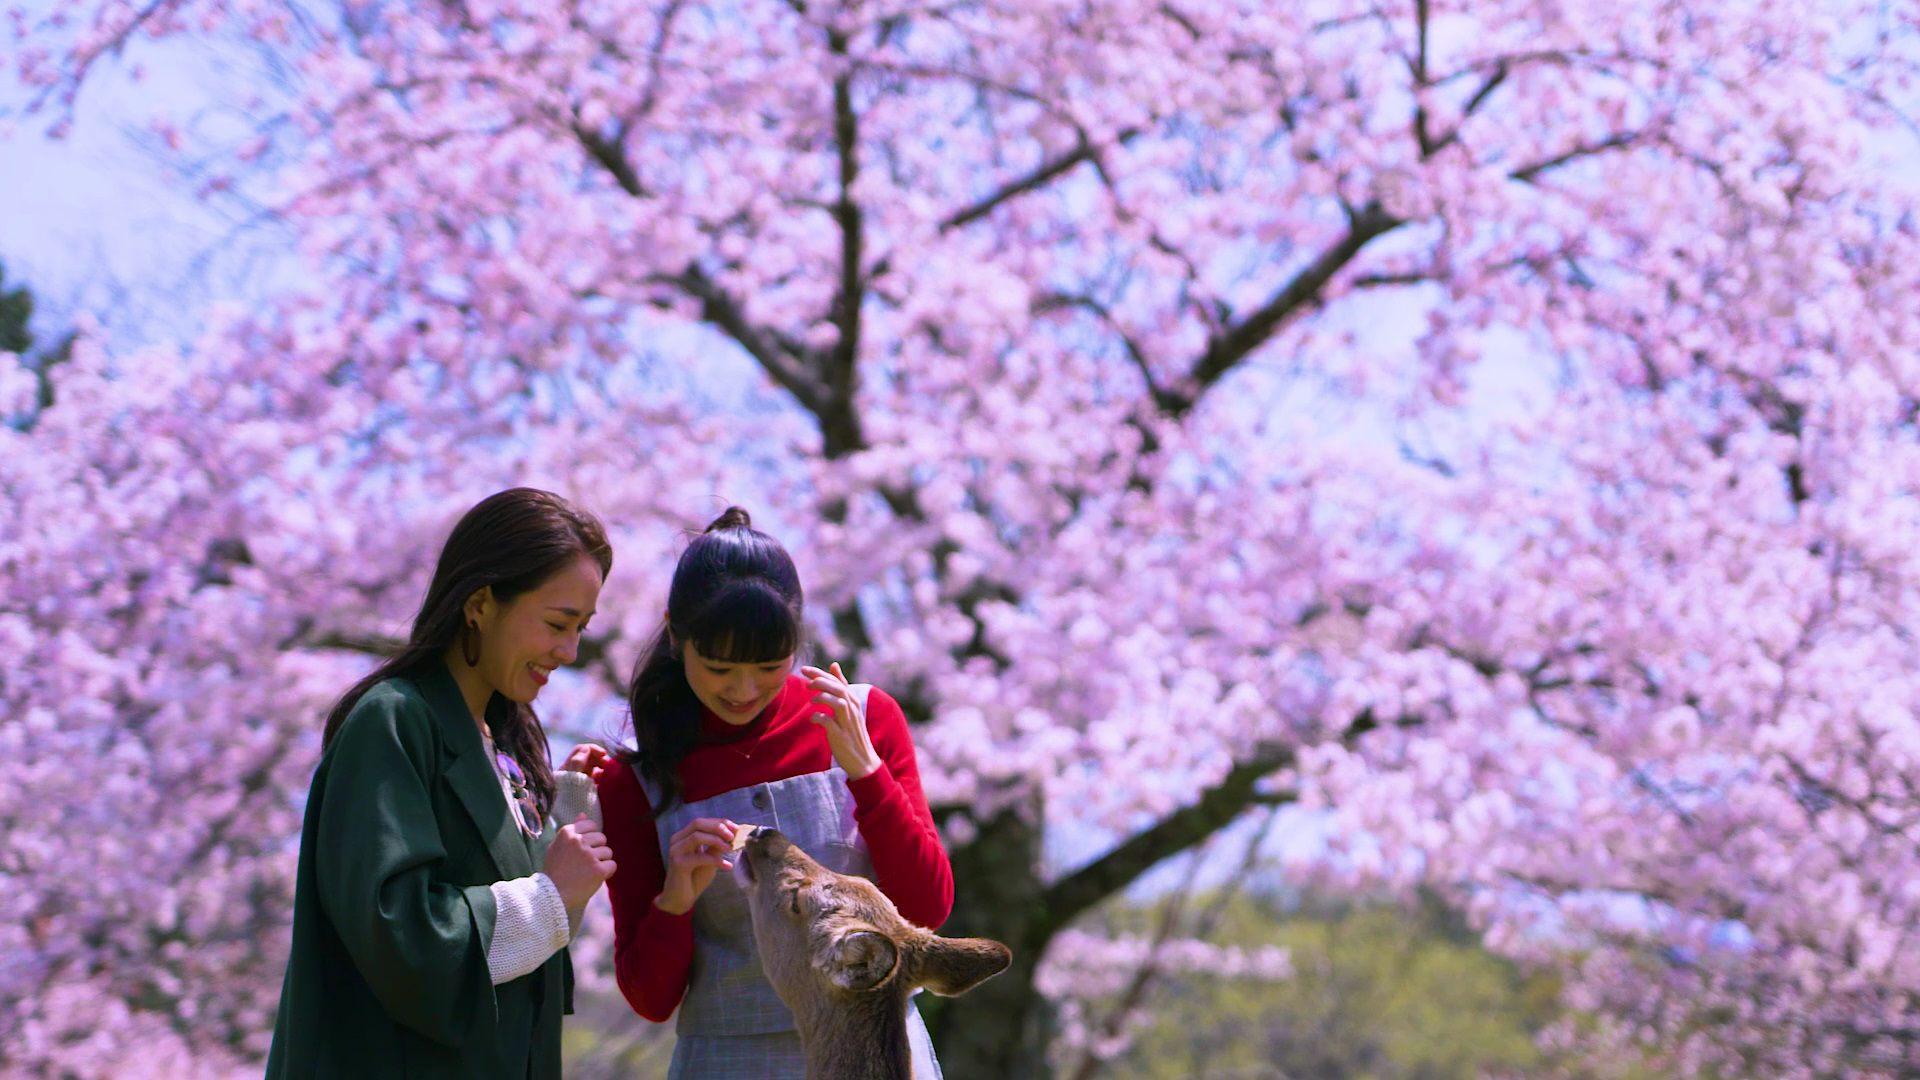 Cherry trees in full bloom and friendly wild deer greet visitors.